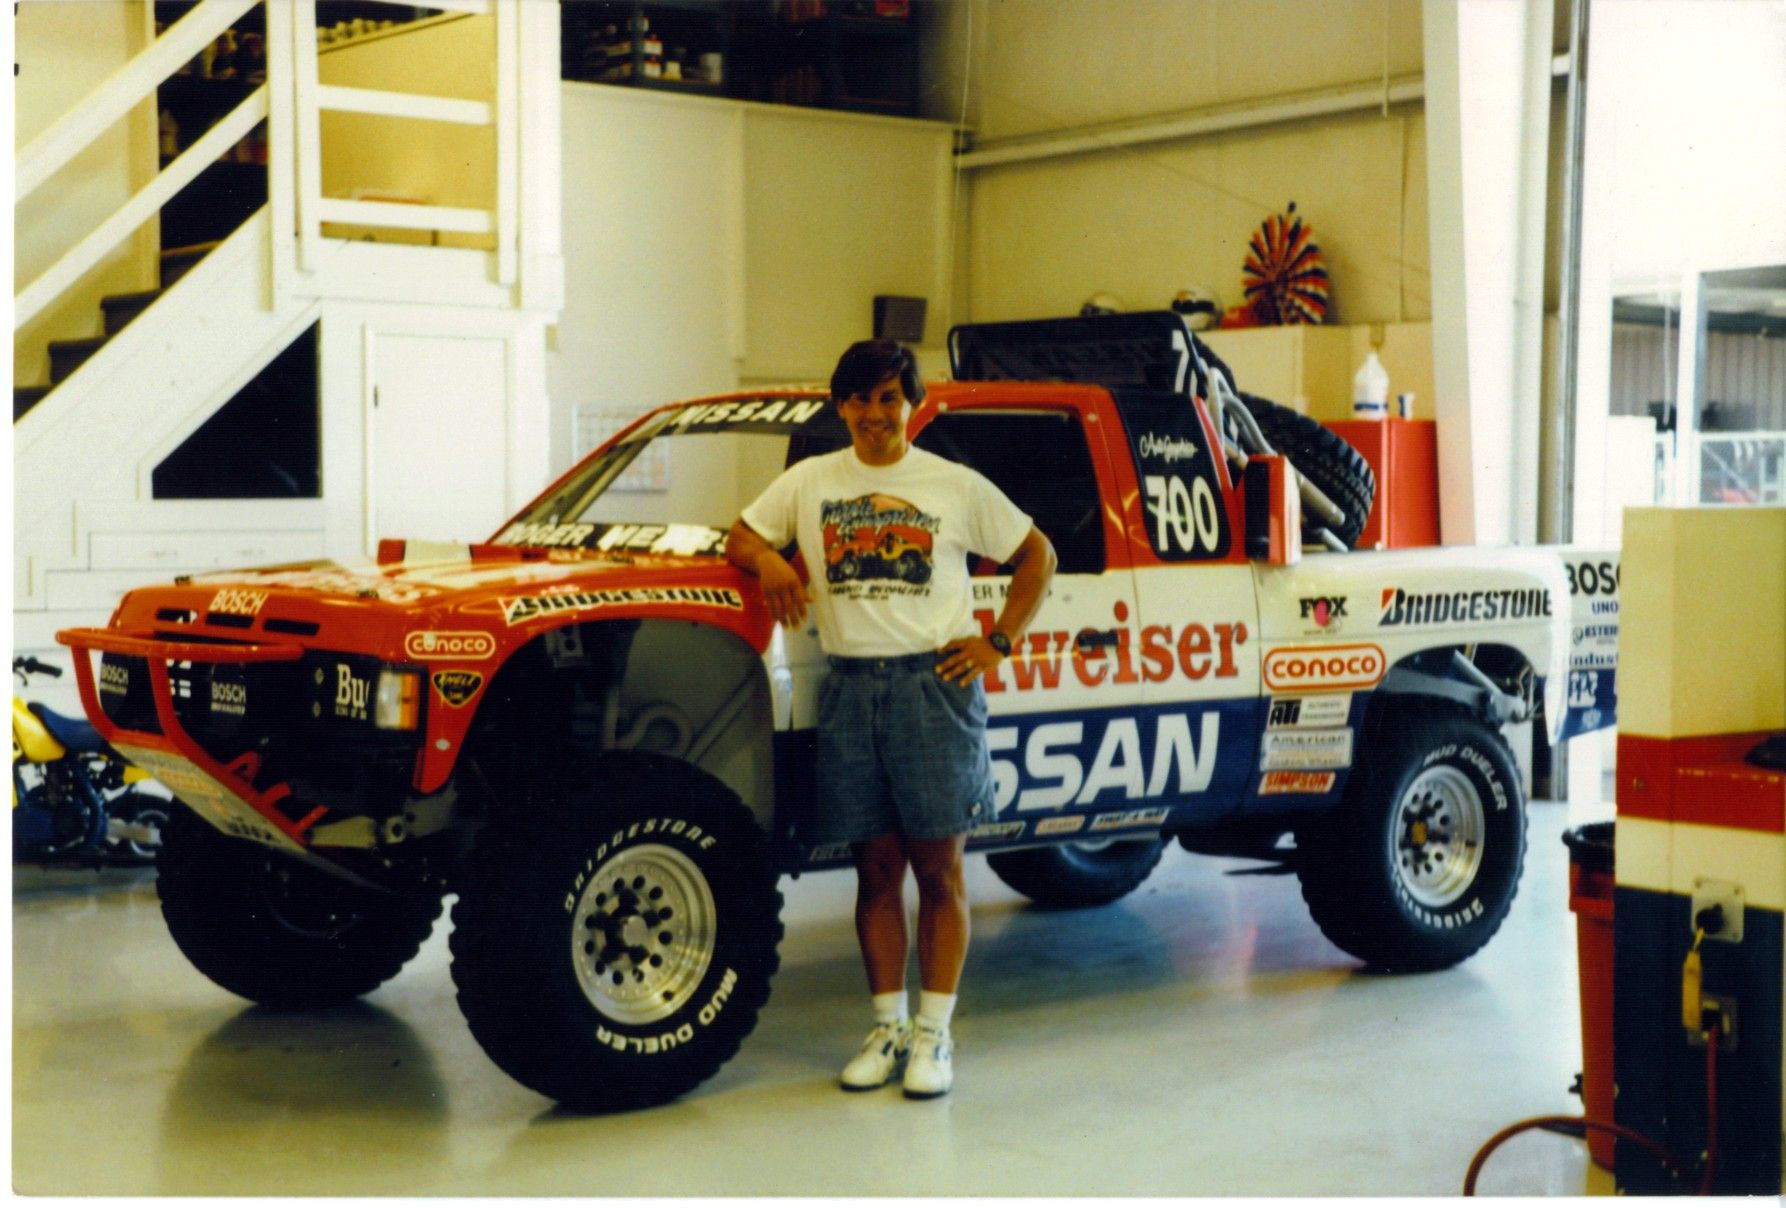 Nissan d21 24 crew cab 4x4